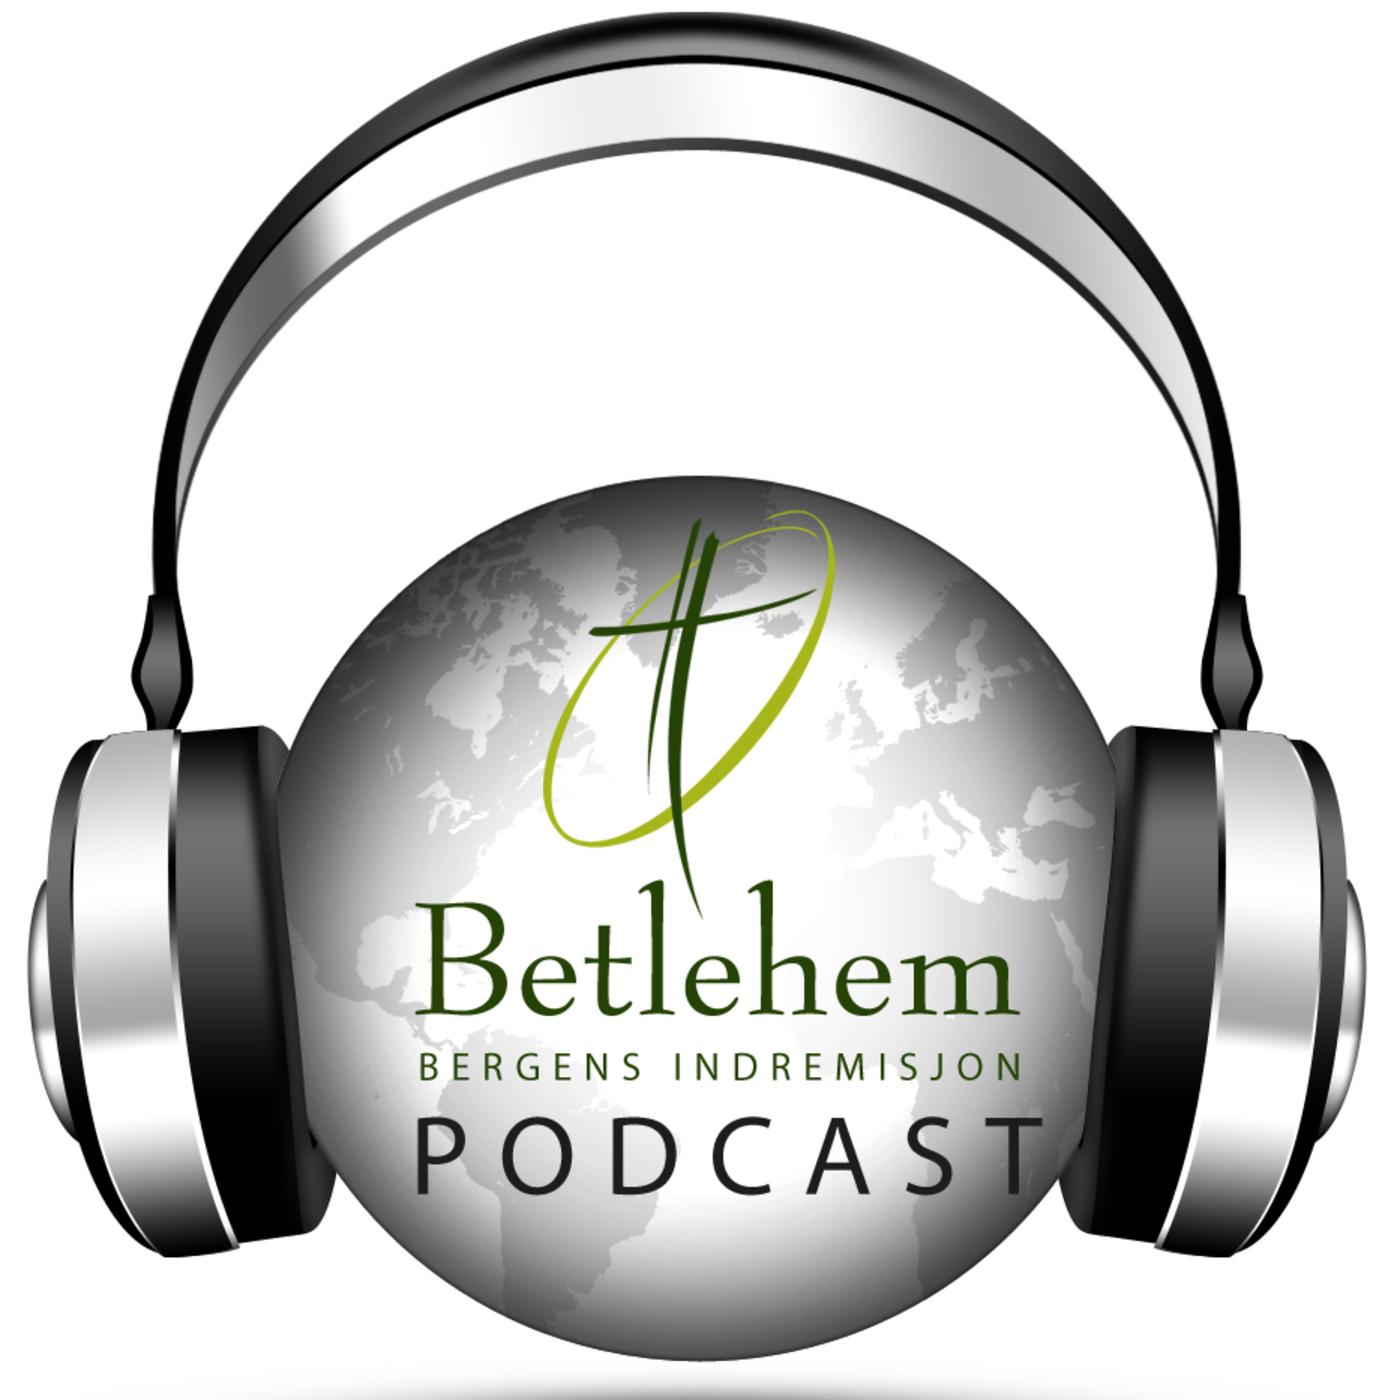 Betlehems podcast